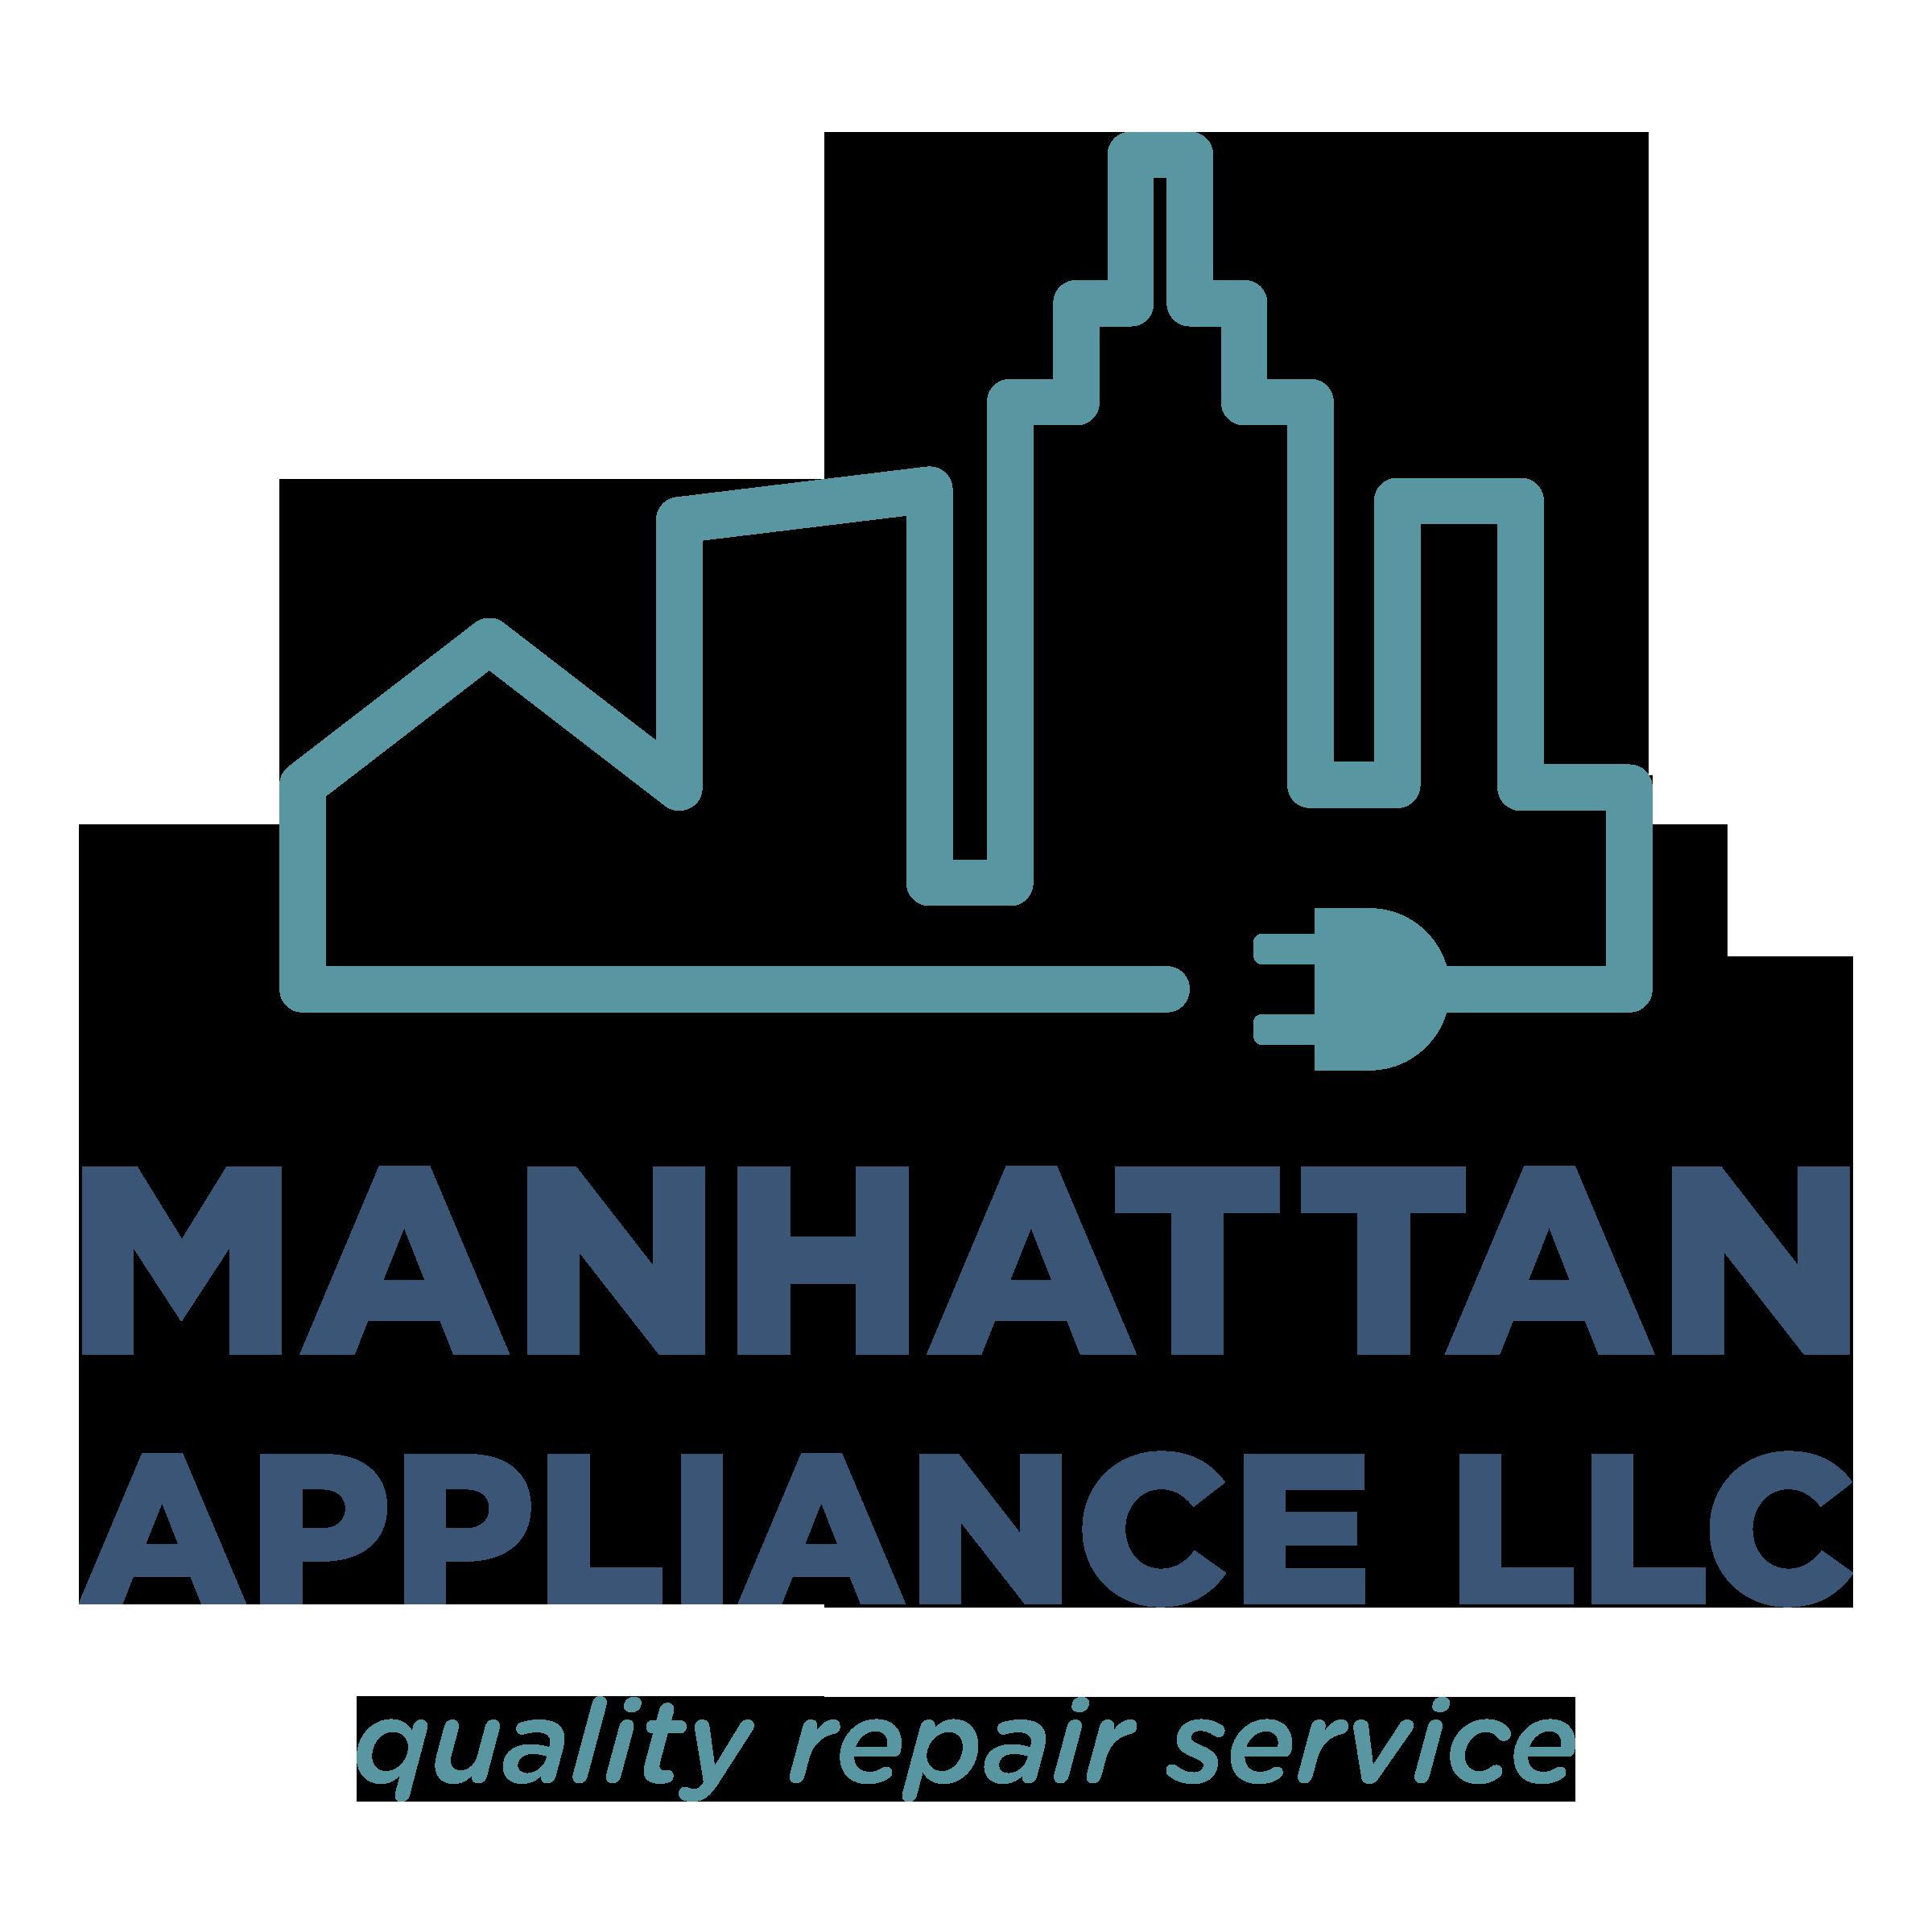 Manhattan Appliance LLC